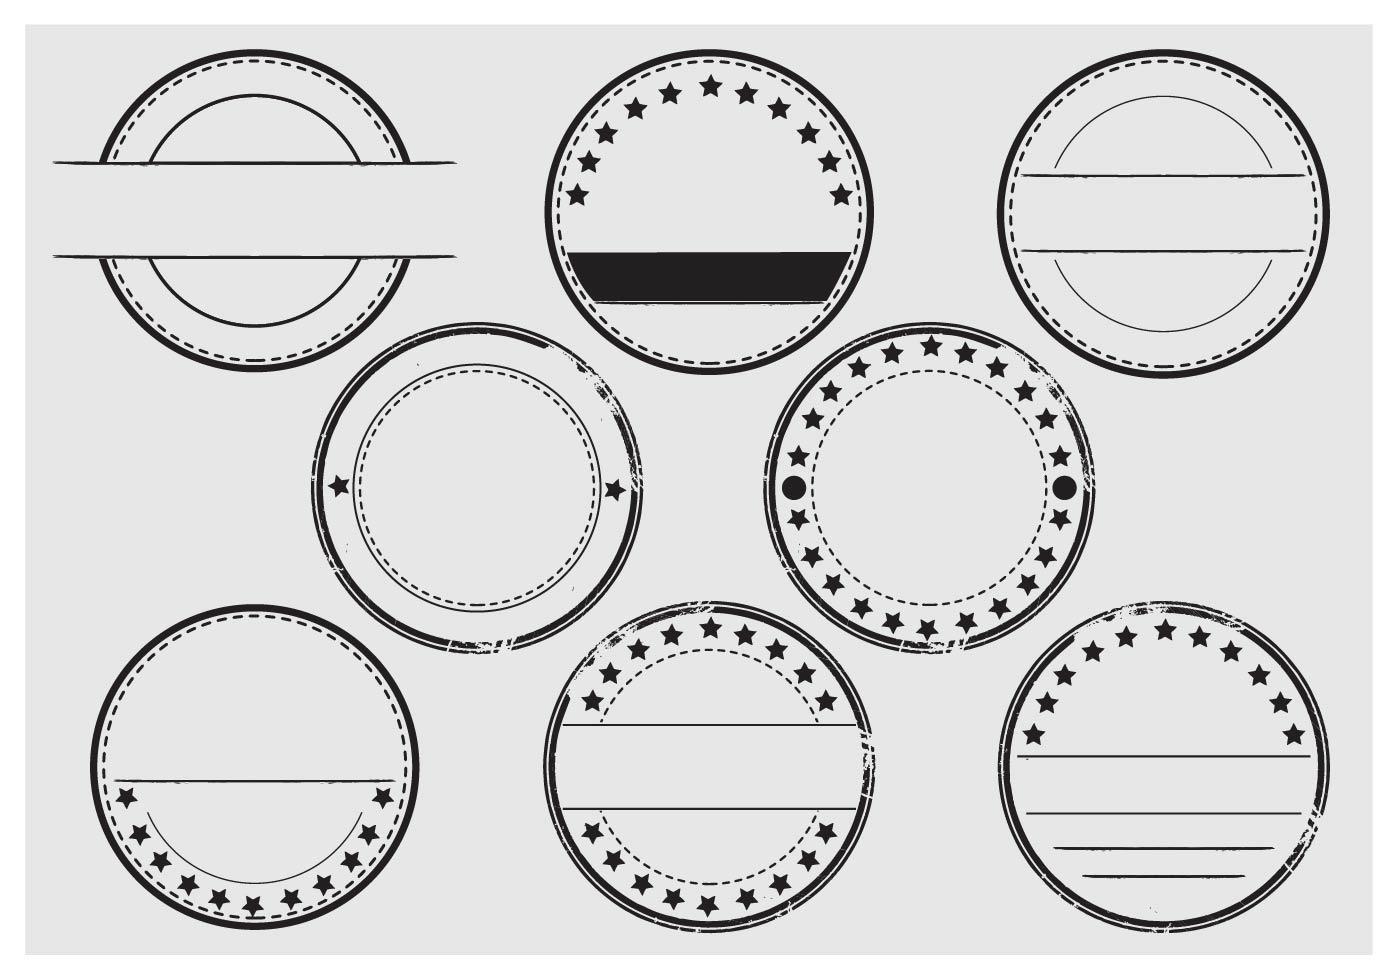 Stempel Stamp Vector Set - Download Free Vector Art, Stock ...